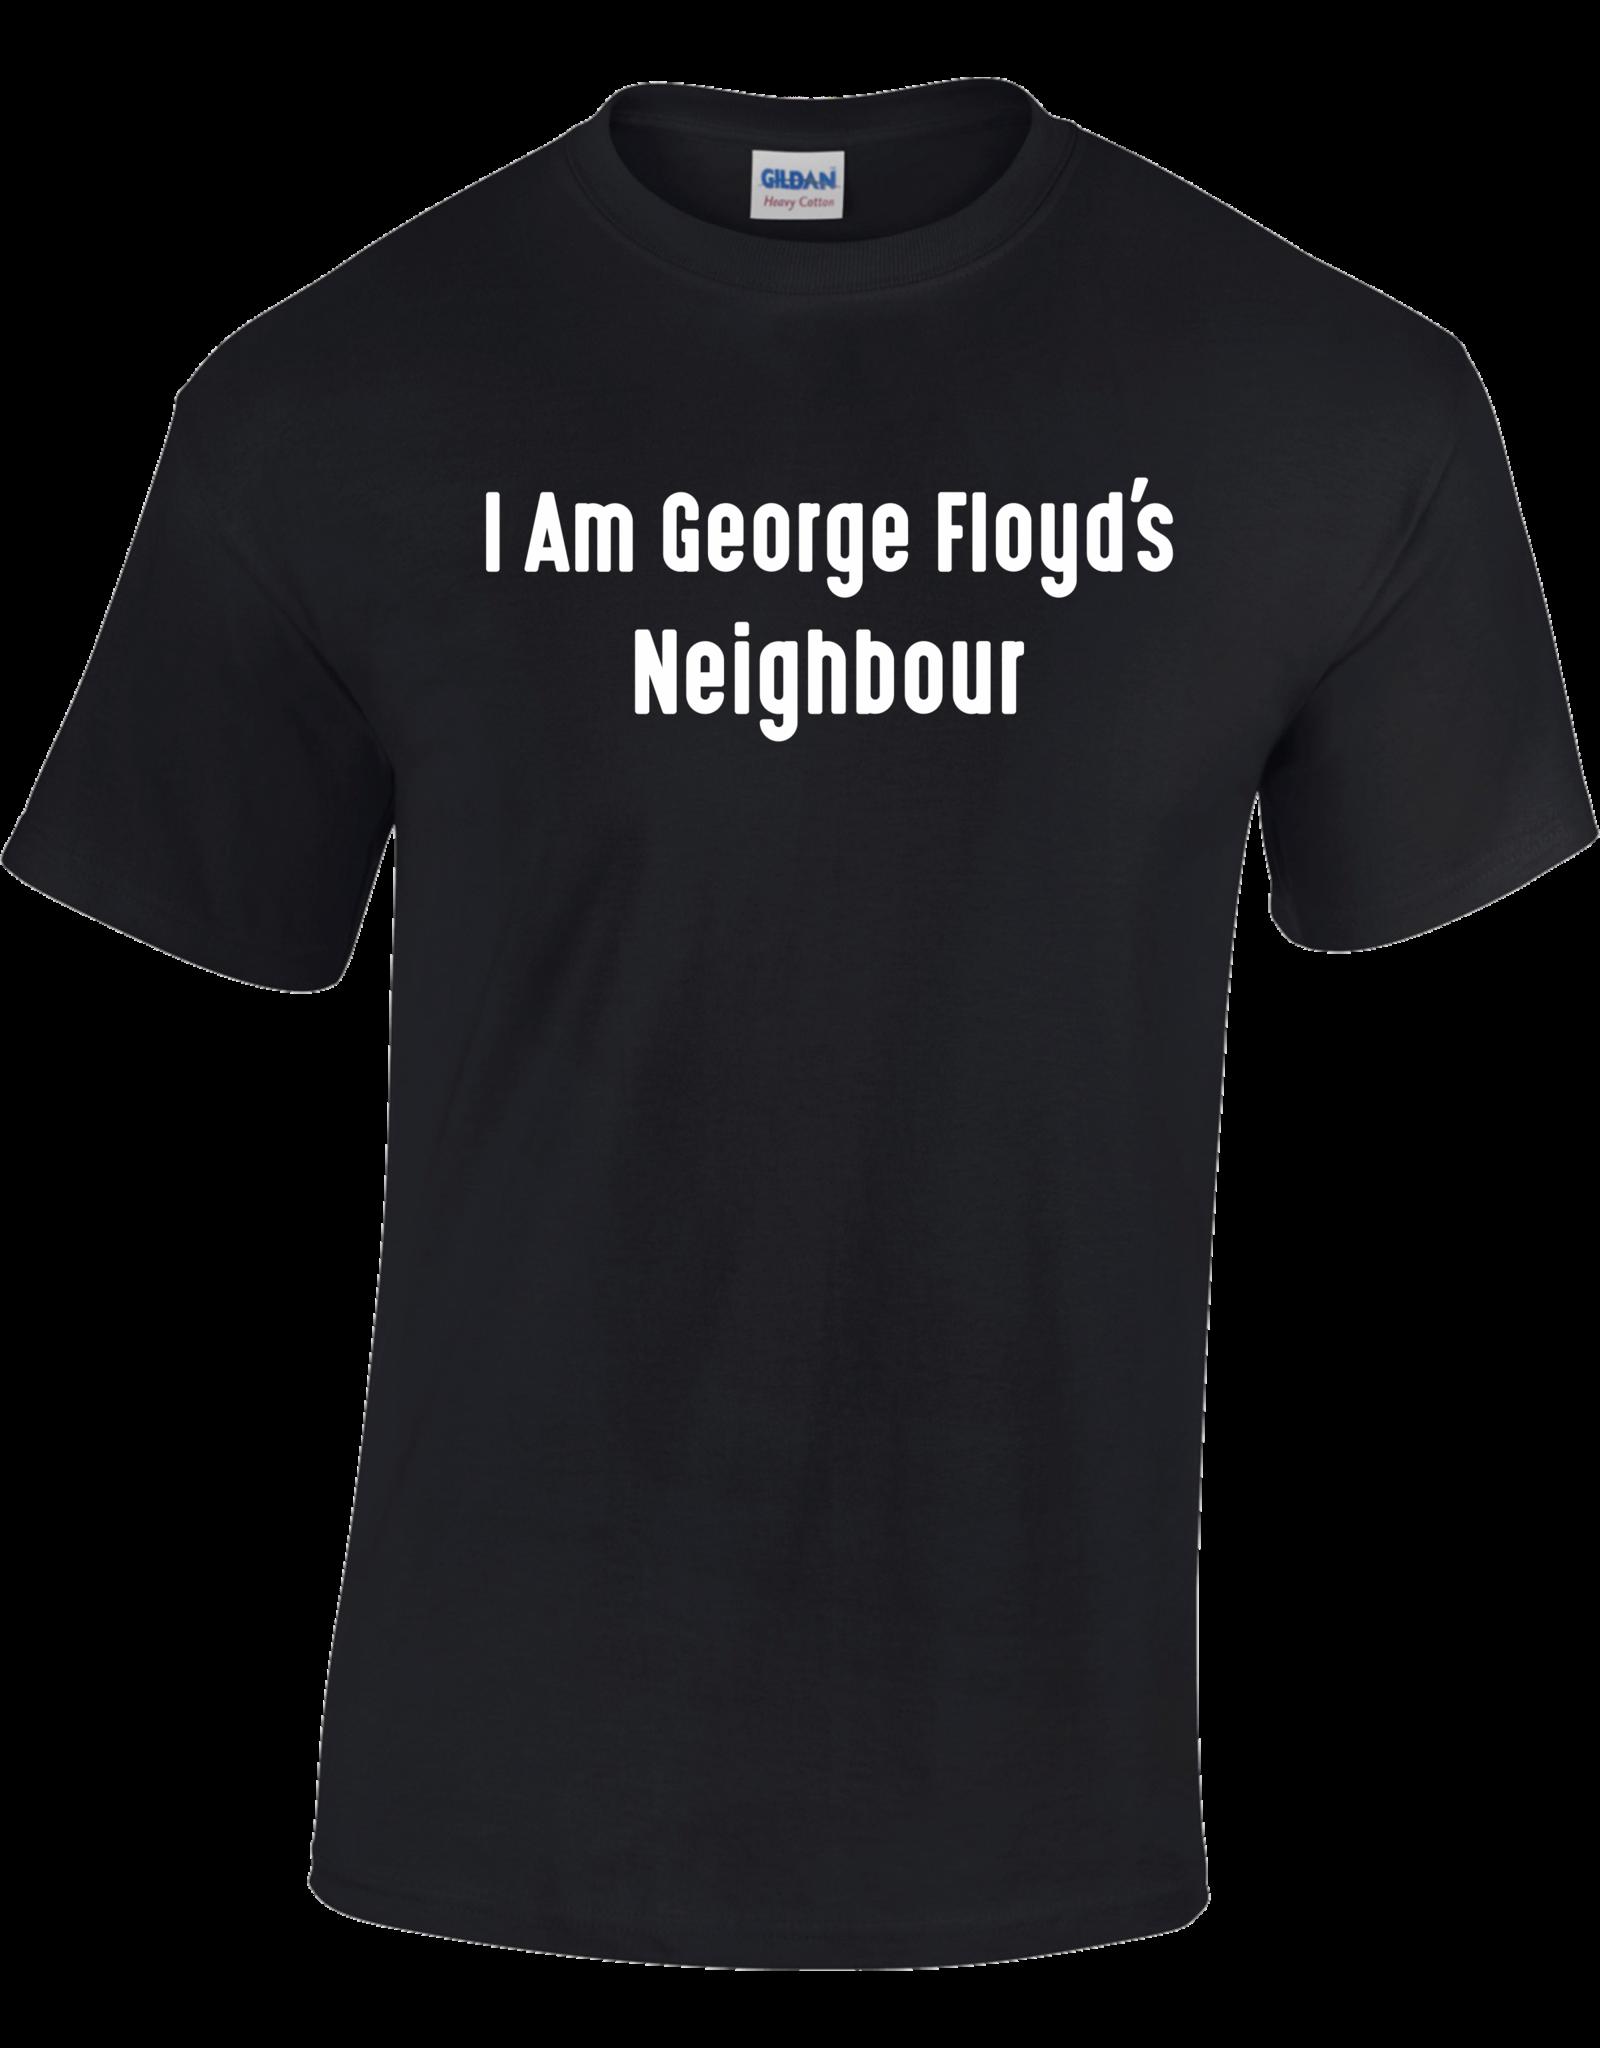 Gildan I Am George Floyd's Neighbour